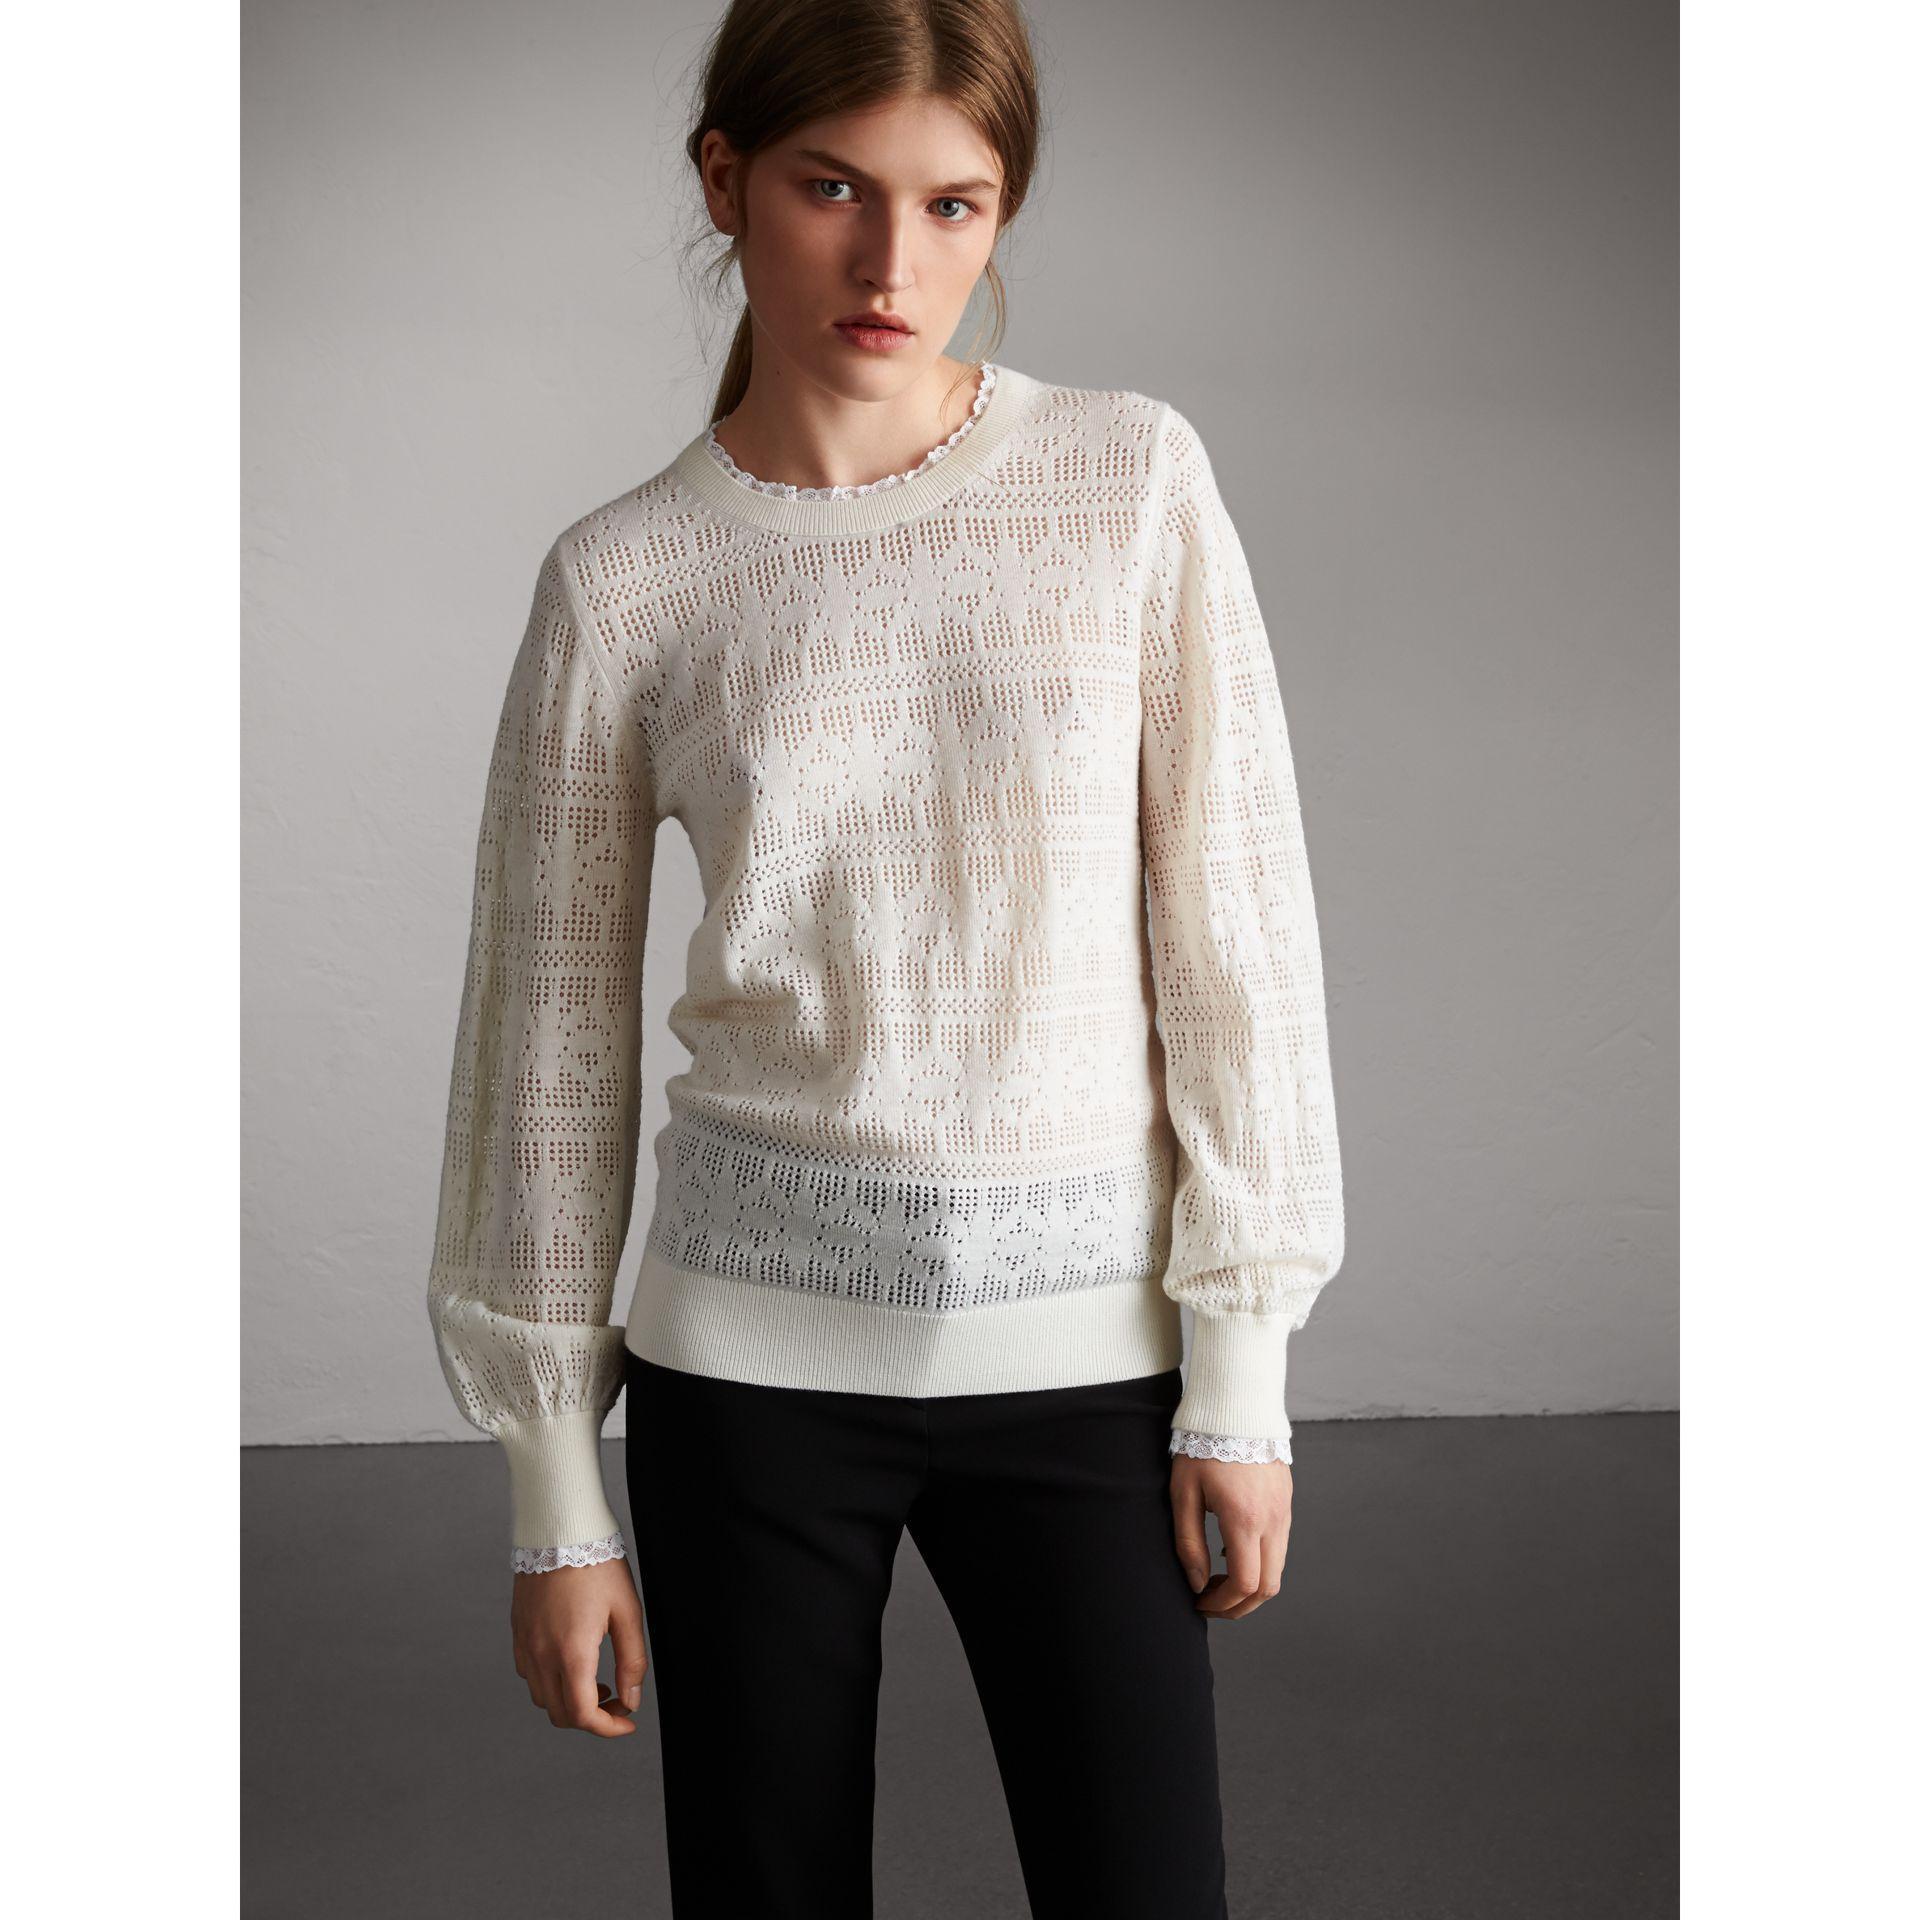 Loft Lou And Grey Sweater